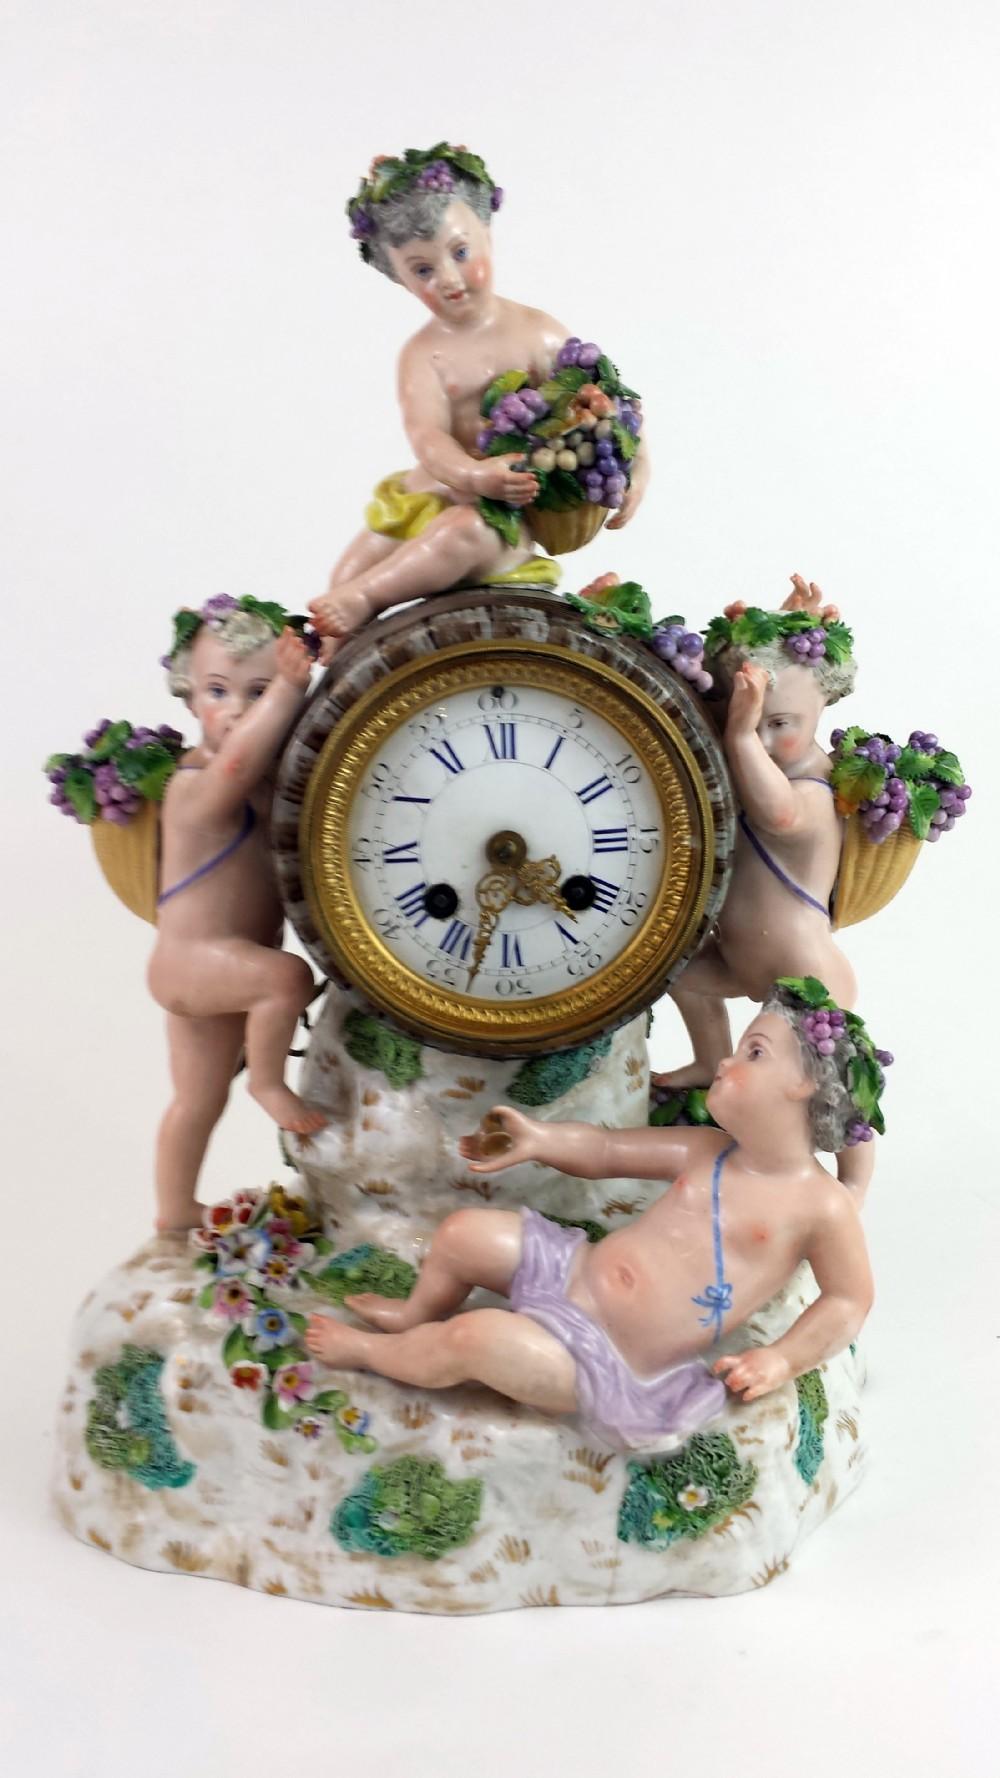 19th century german porcelain clock